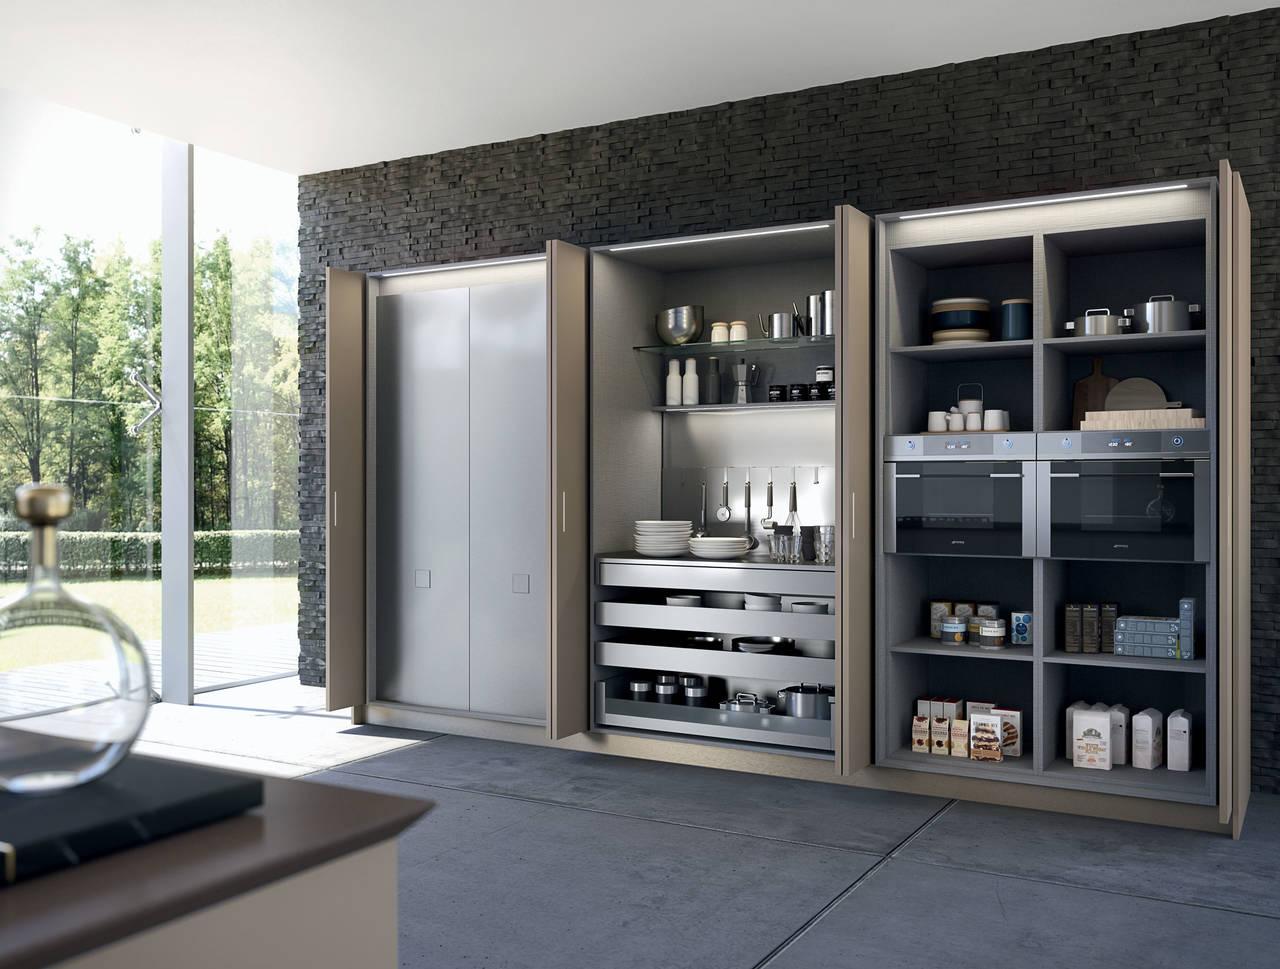 Cucine Armadio A Scomparsa. Stunning Cucine Armadio Prezzi Ideas ...